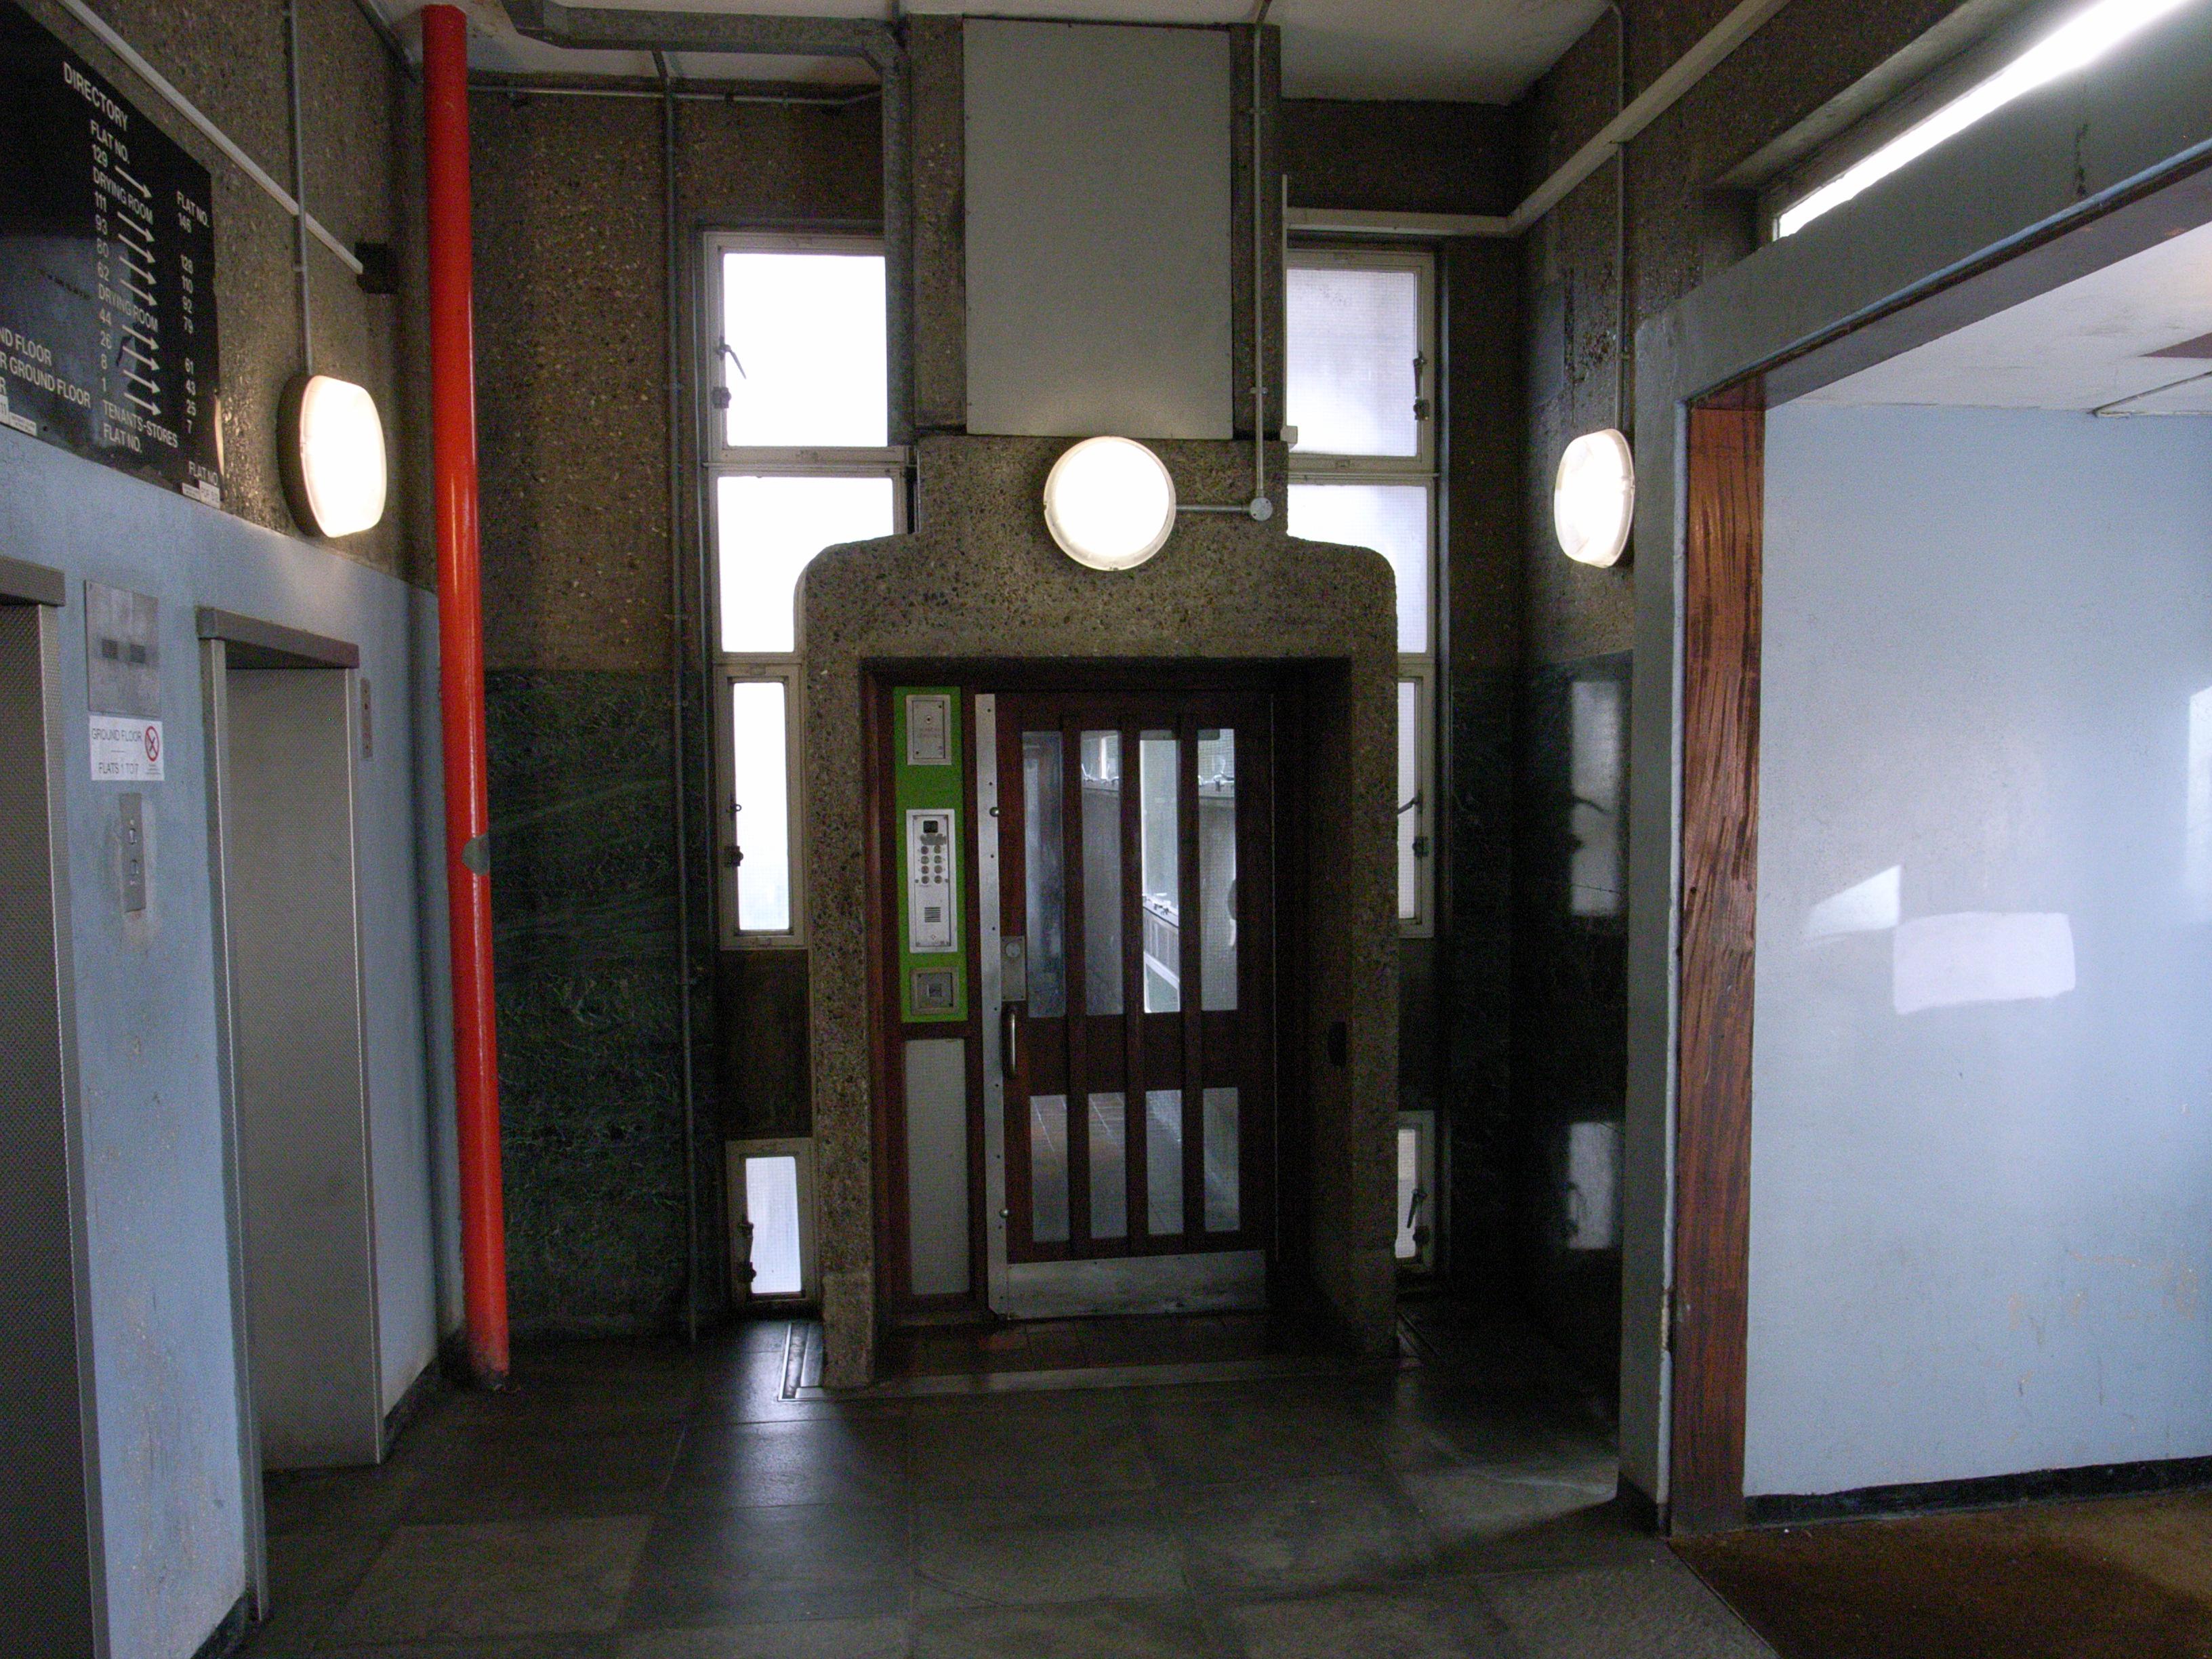 File Lobby The Balfron Tower Jpg Wikimedia Commons